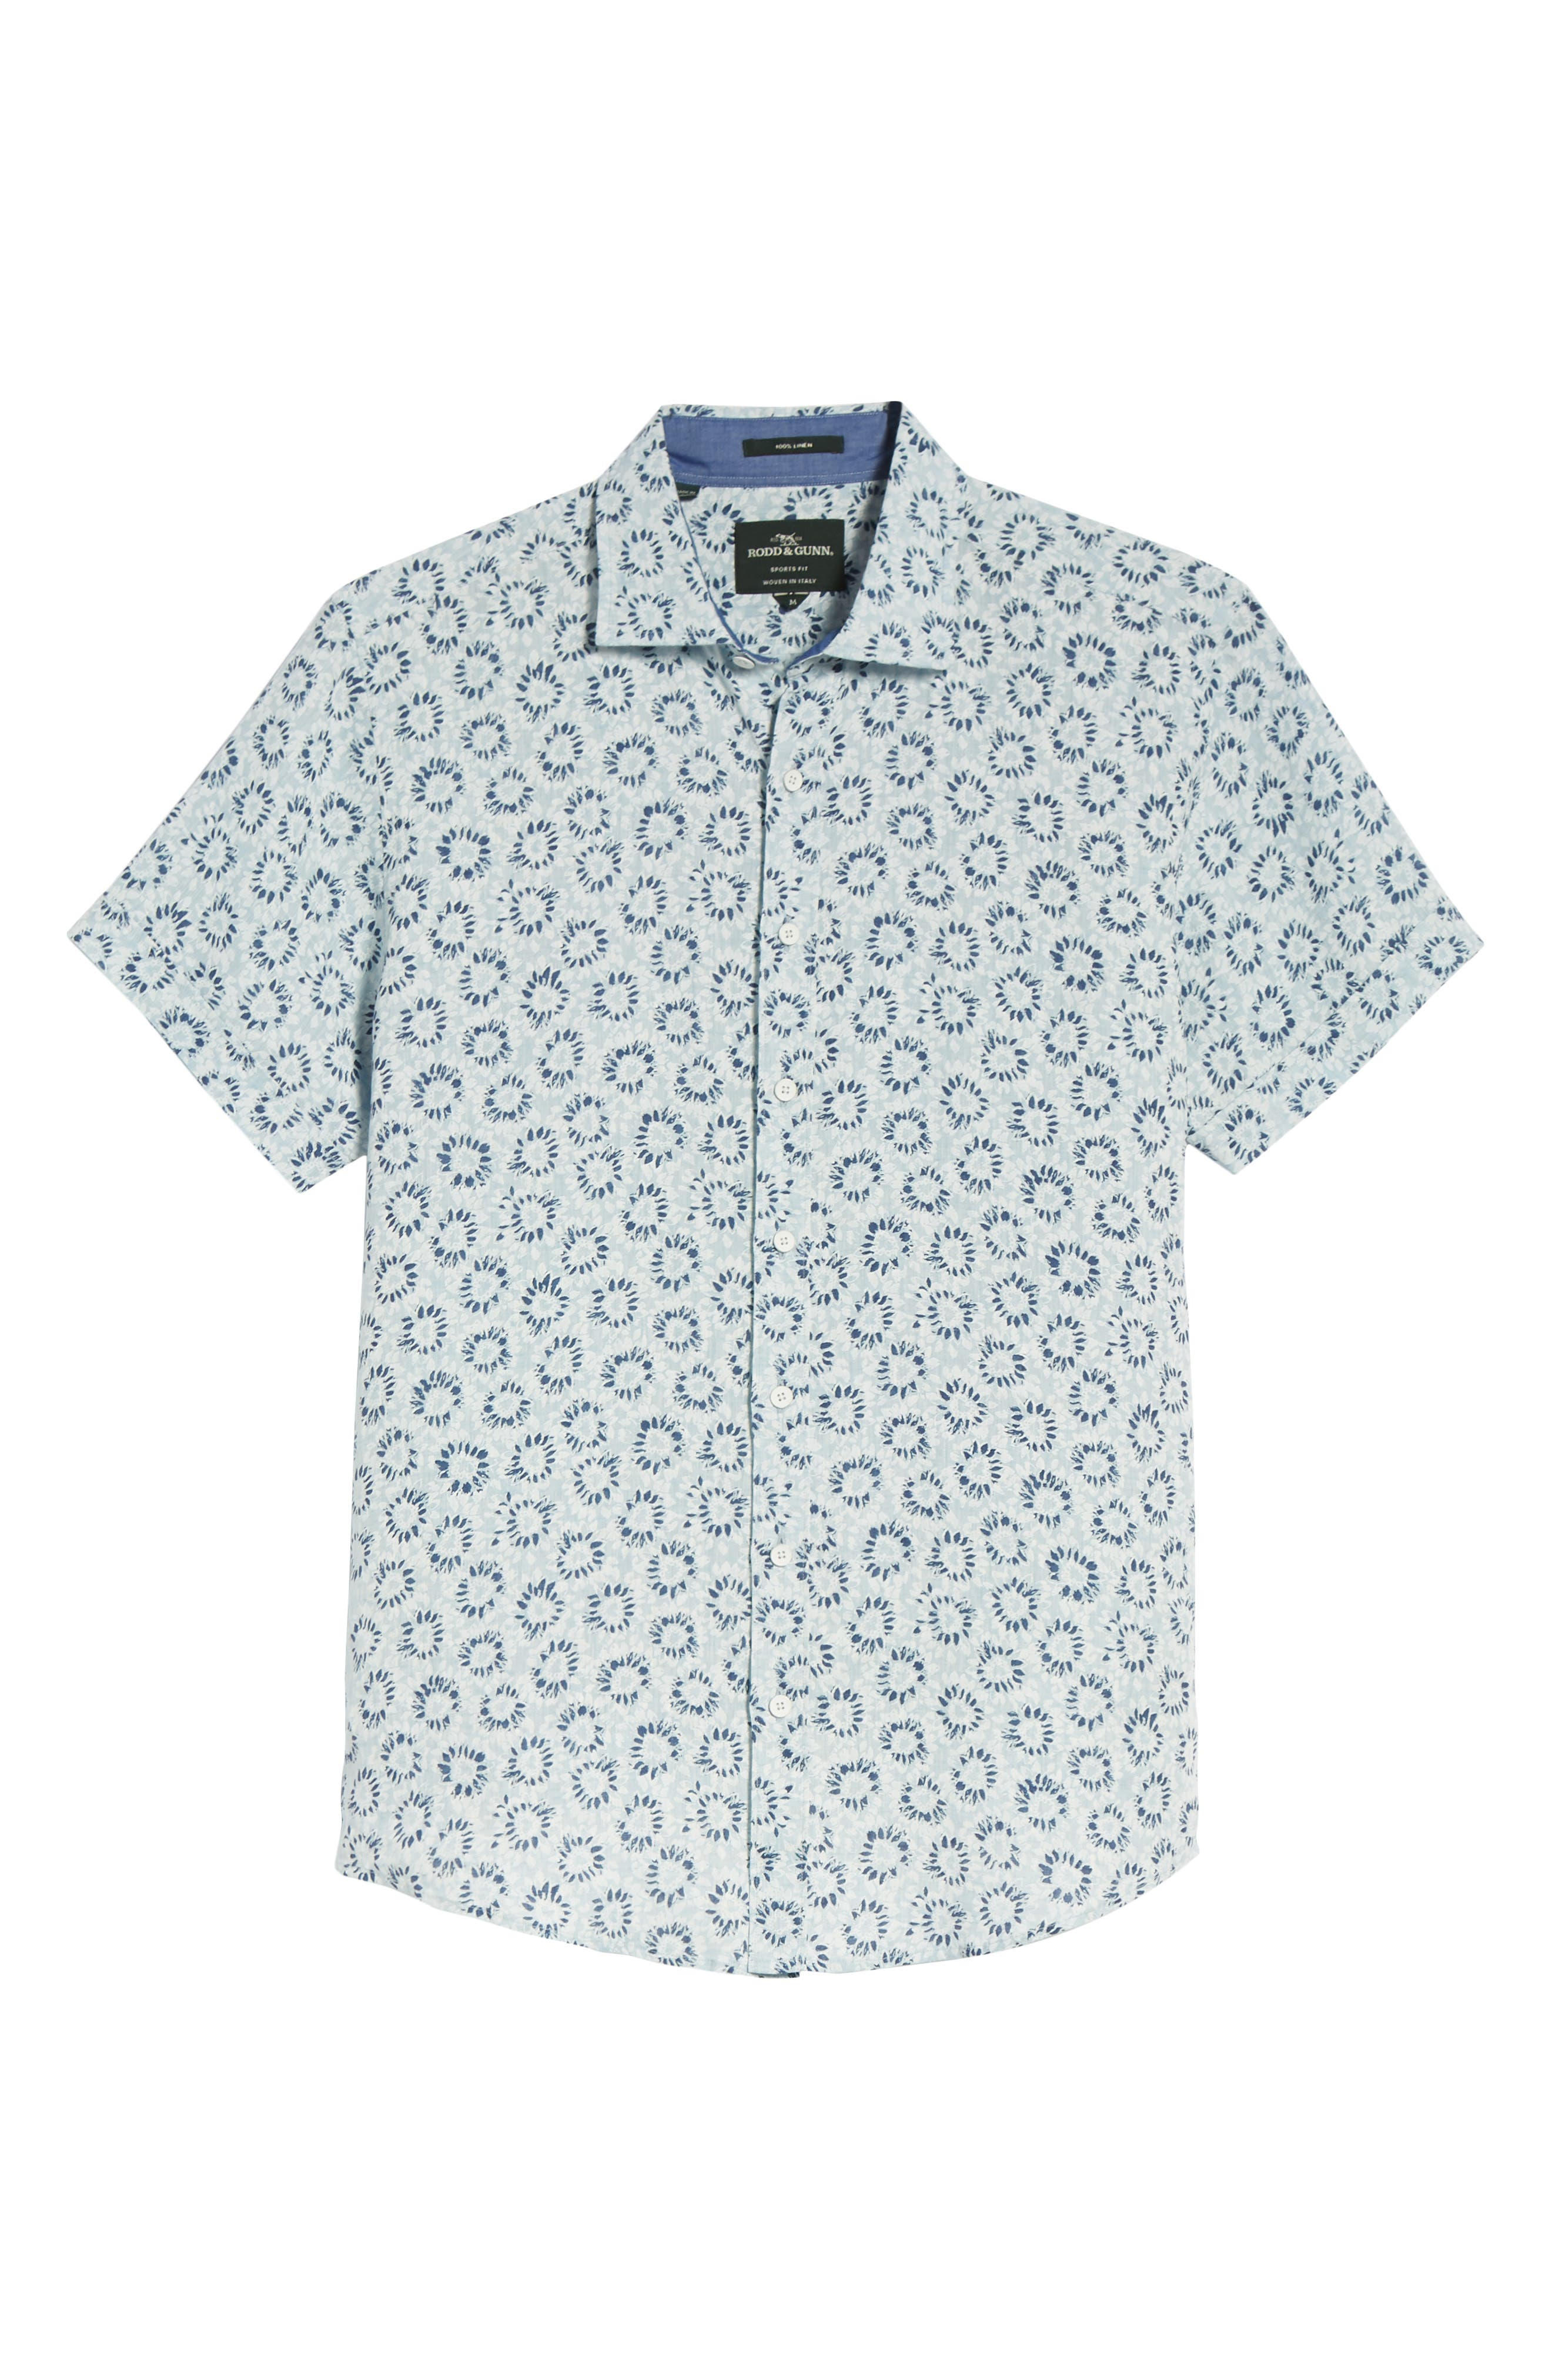 Alford Forest Floral Linen Sport Shirt,                             Alternate thumbnail 6, color,                             SKY